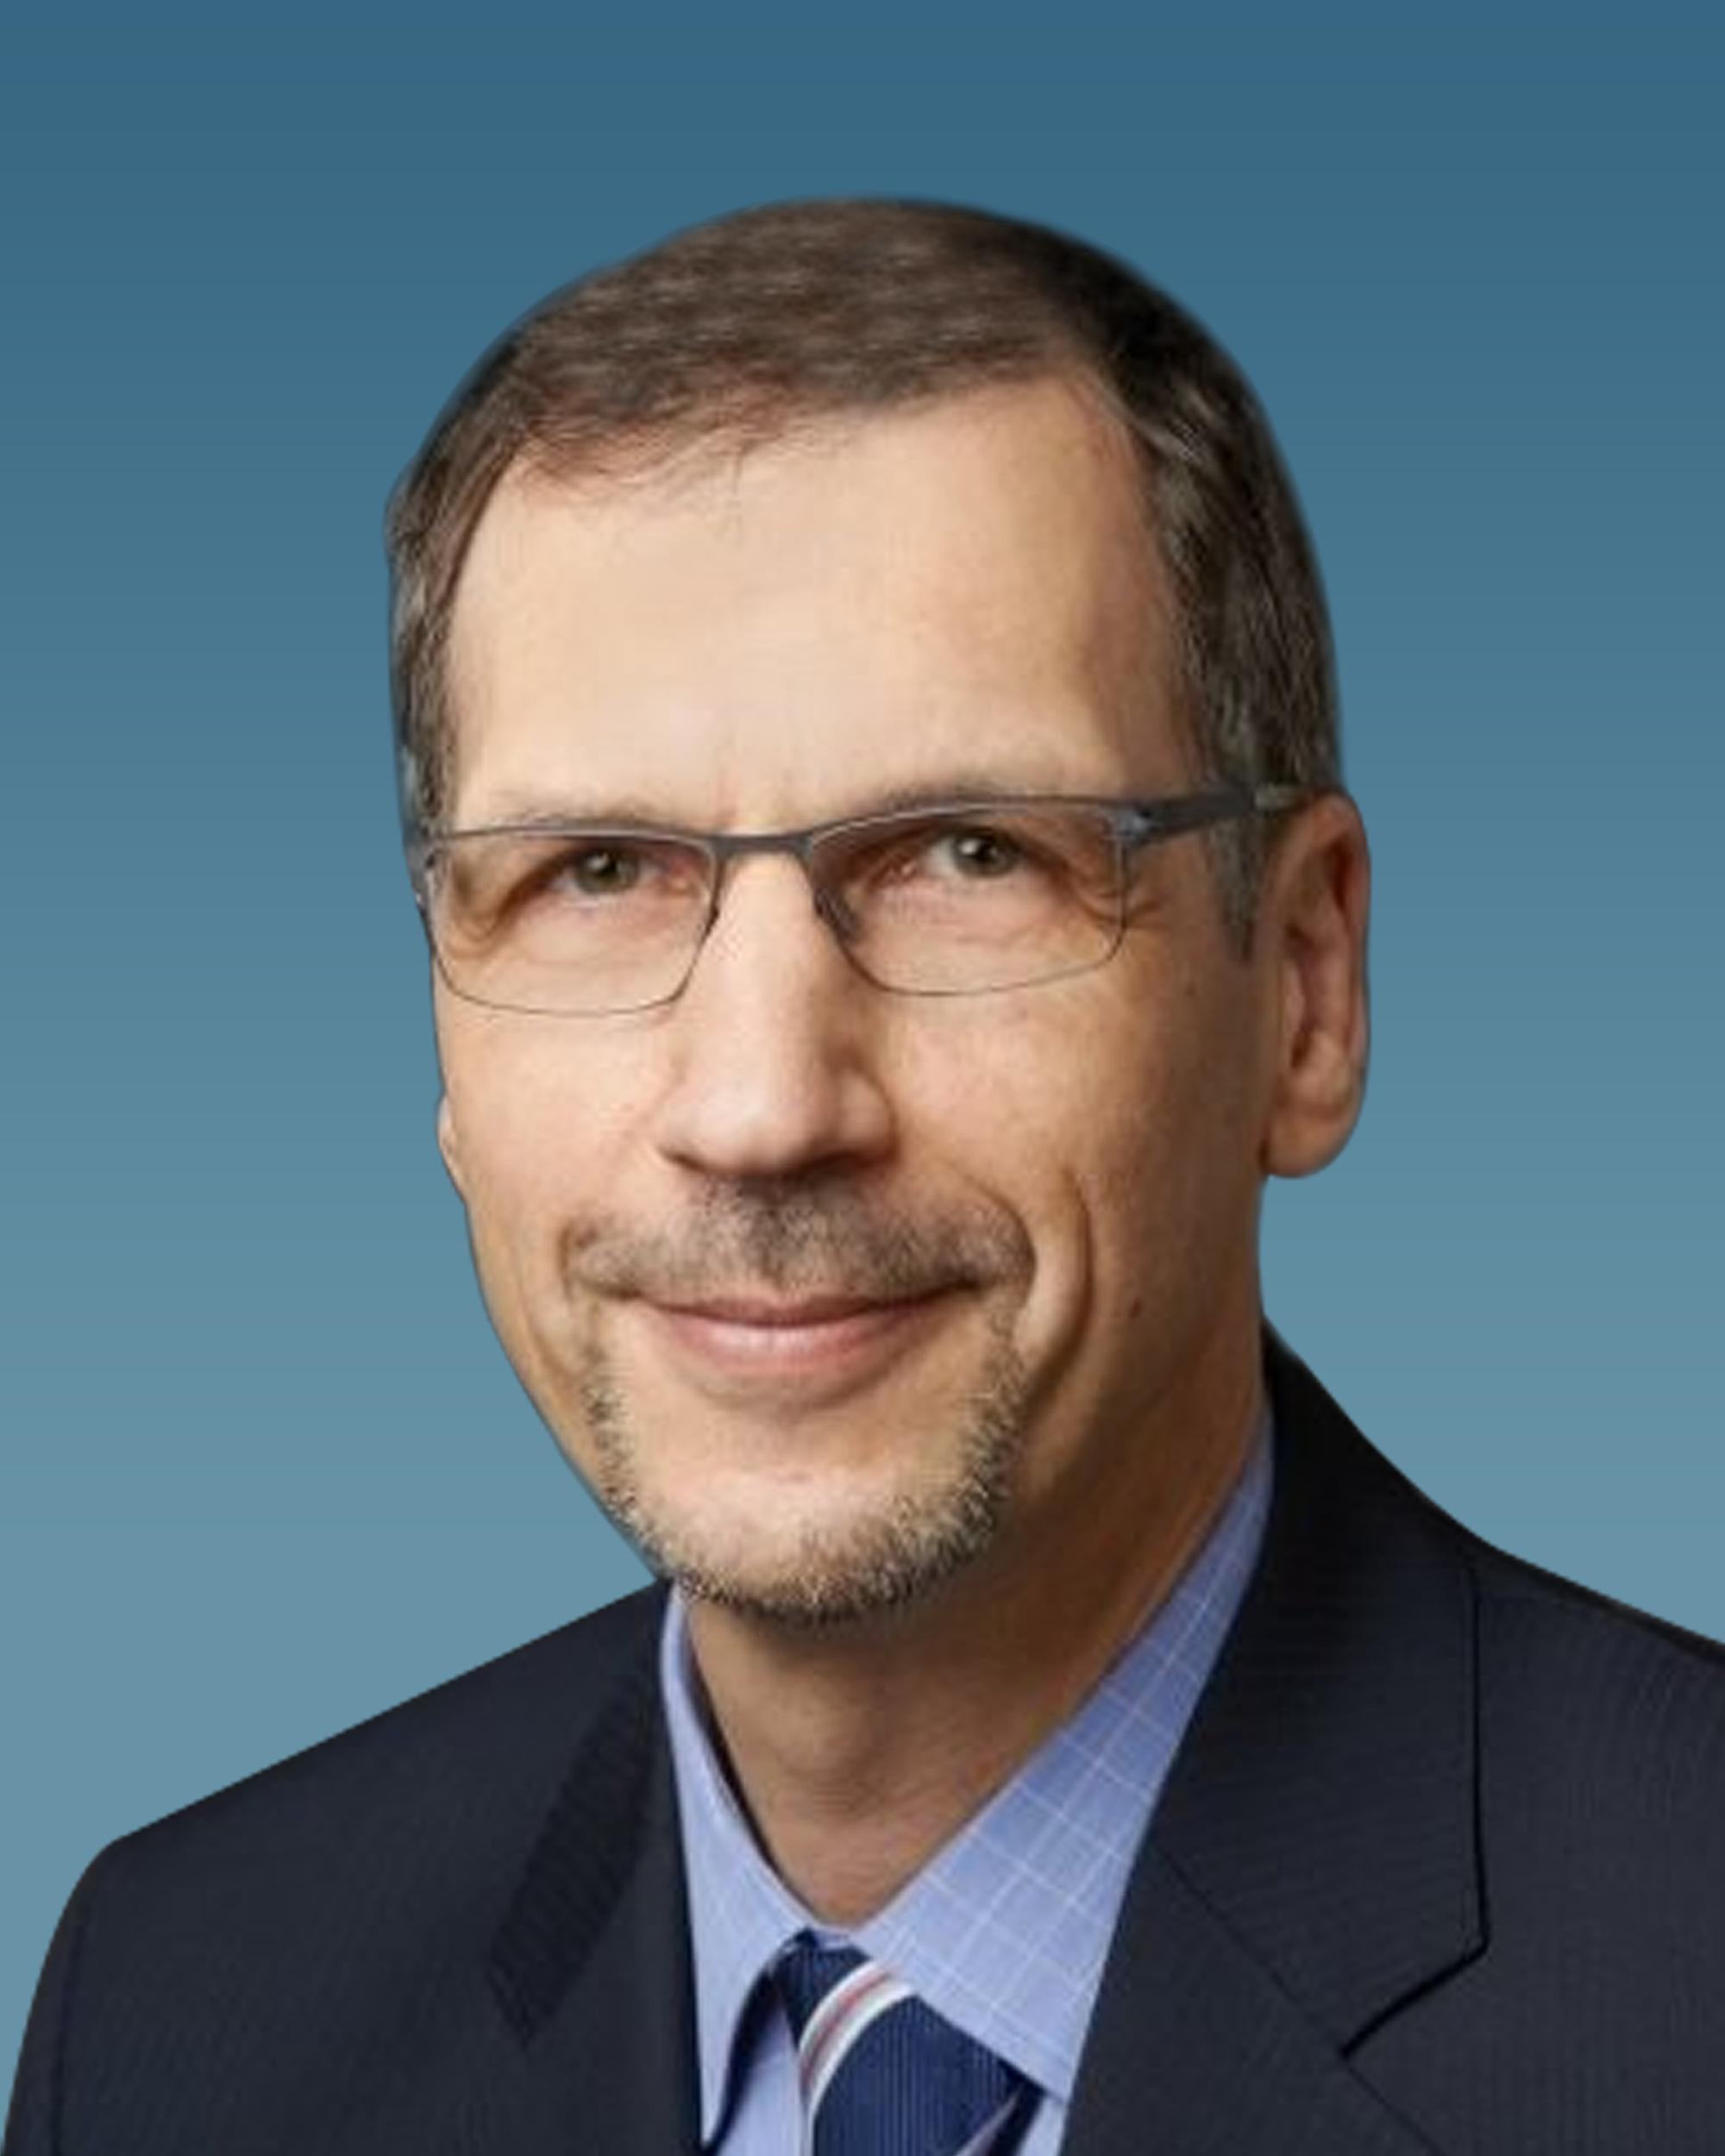 Mr. Stefan Lorenz Land